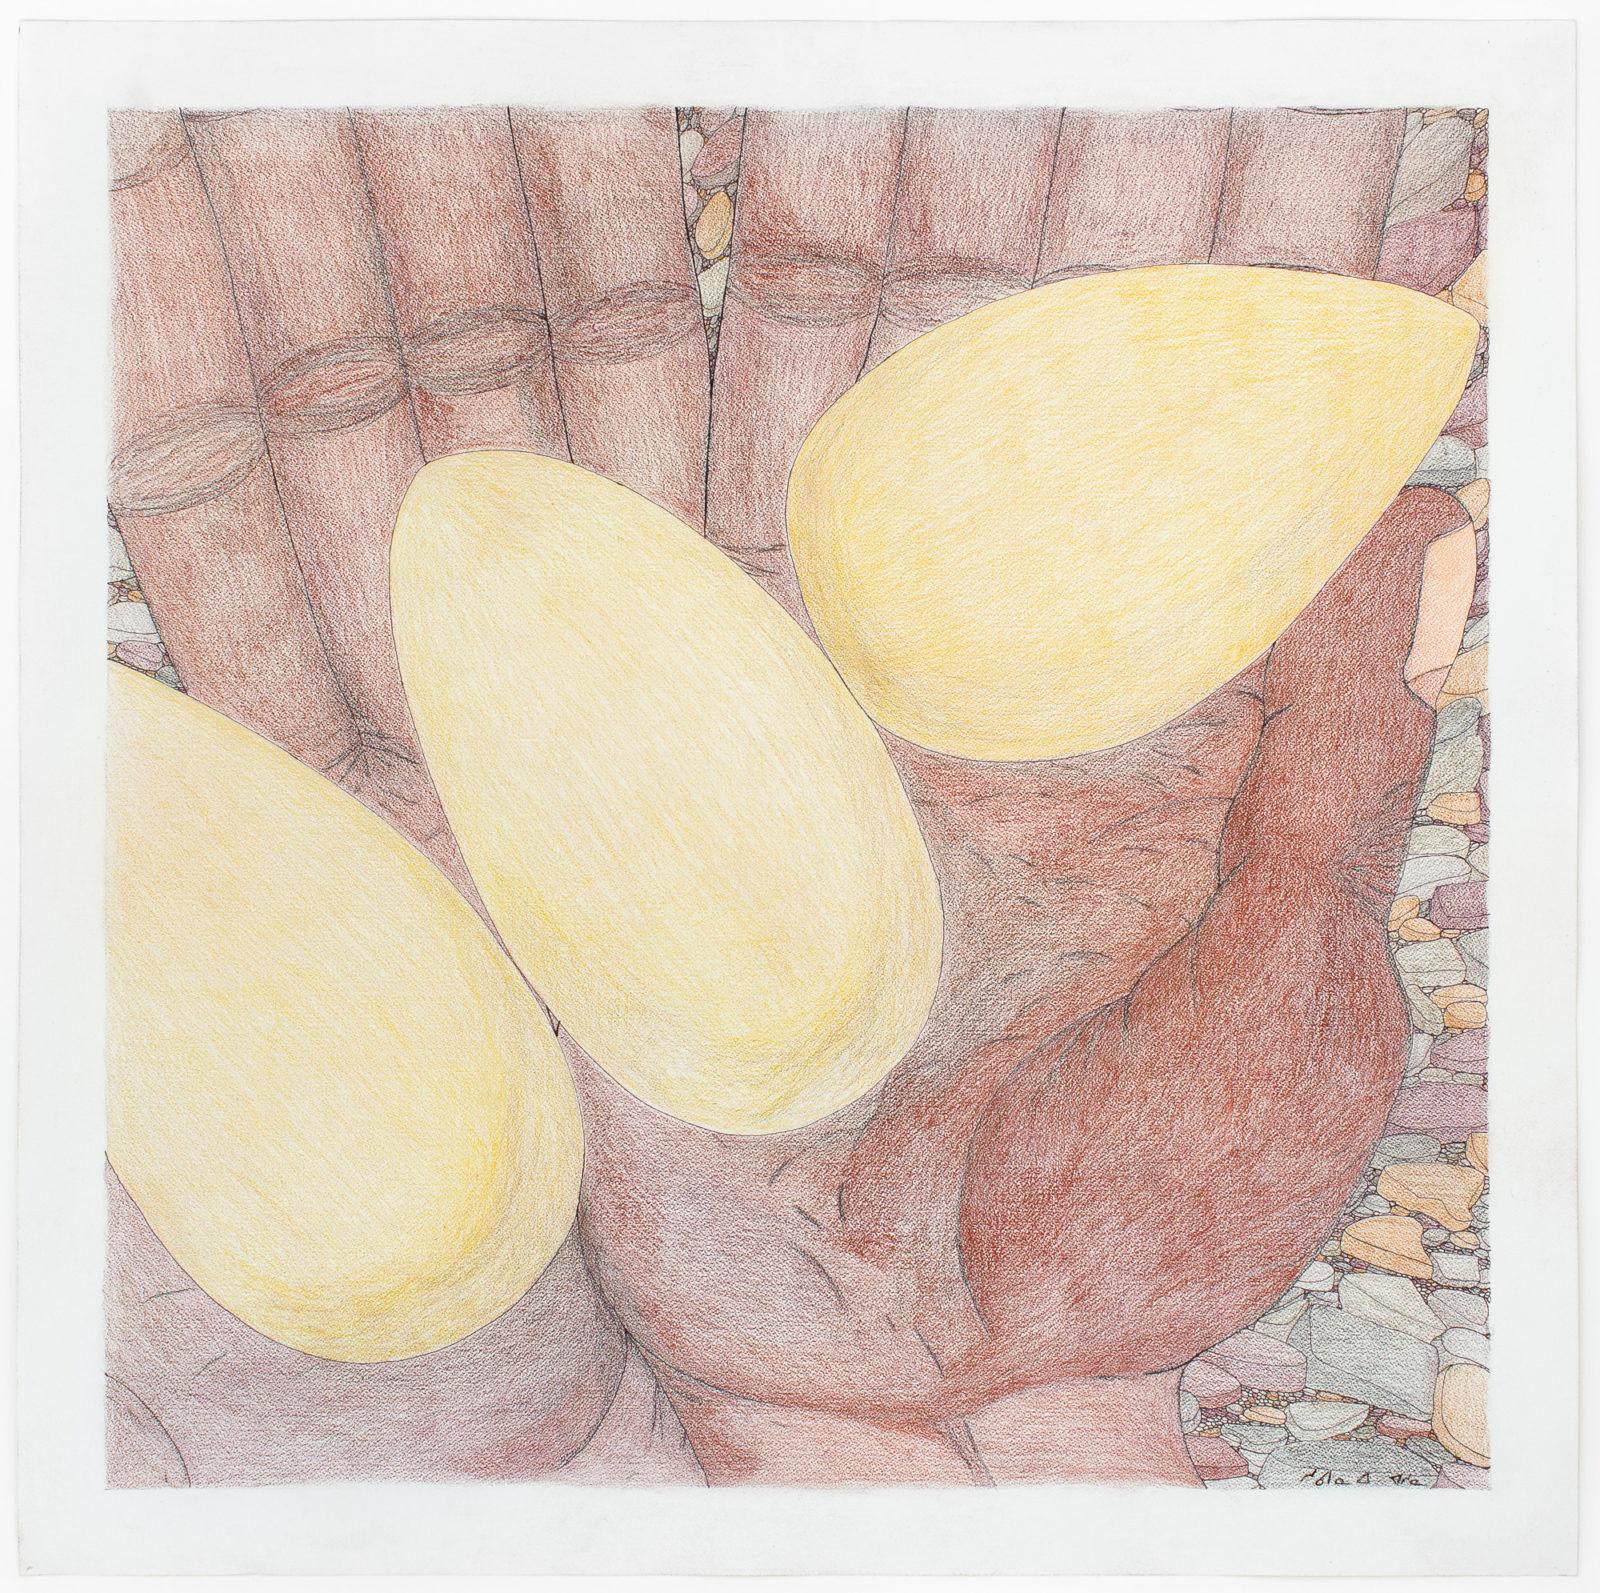 Shuvinai Ashoona - untitled (hands with eggs)